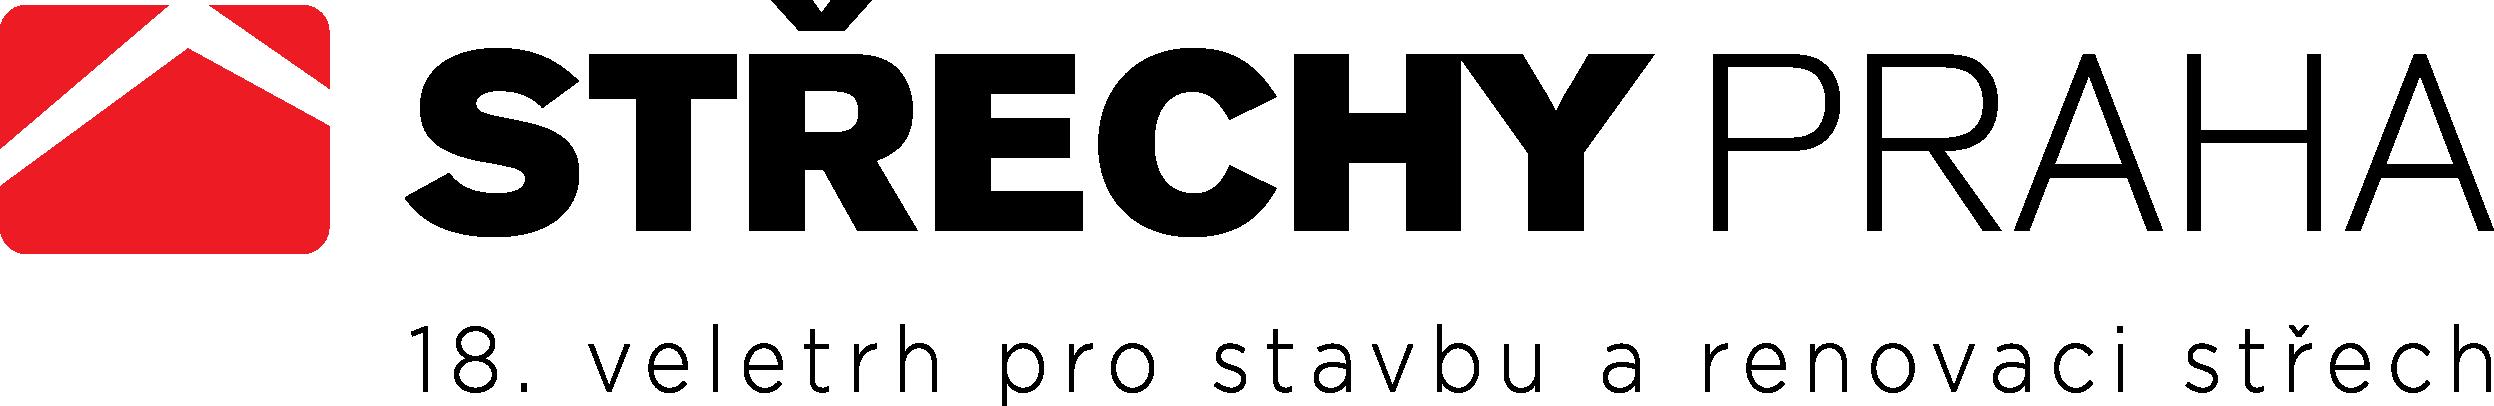 Logo veletrhu Střechy Praha 2015